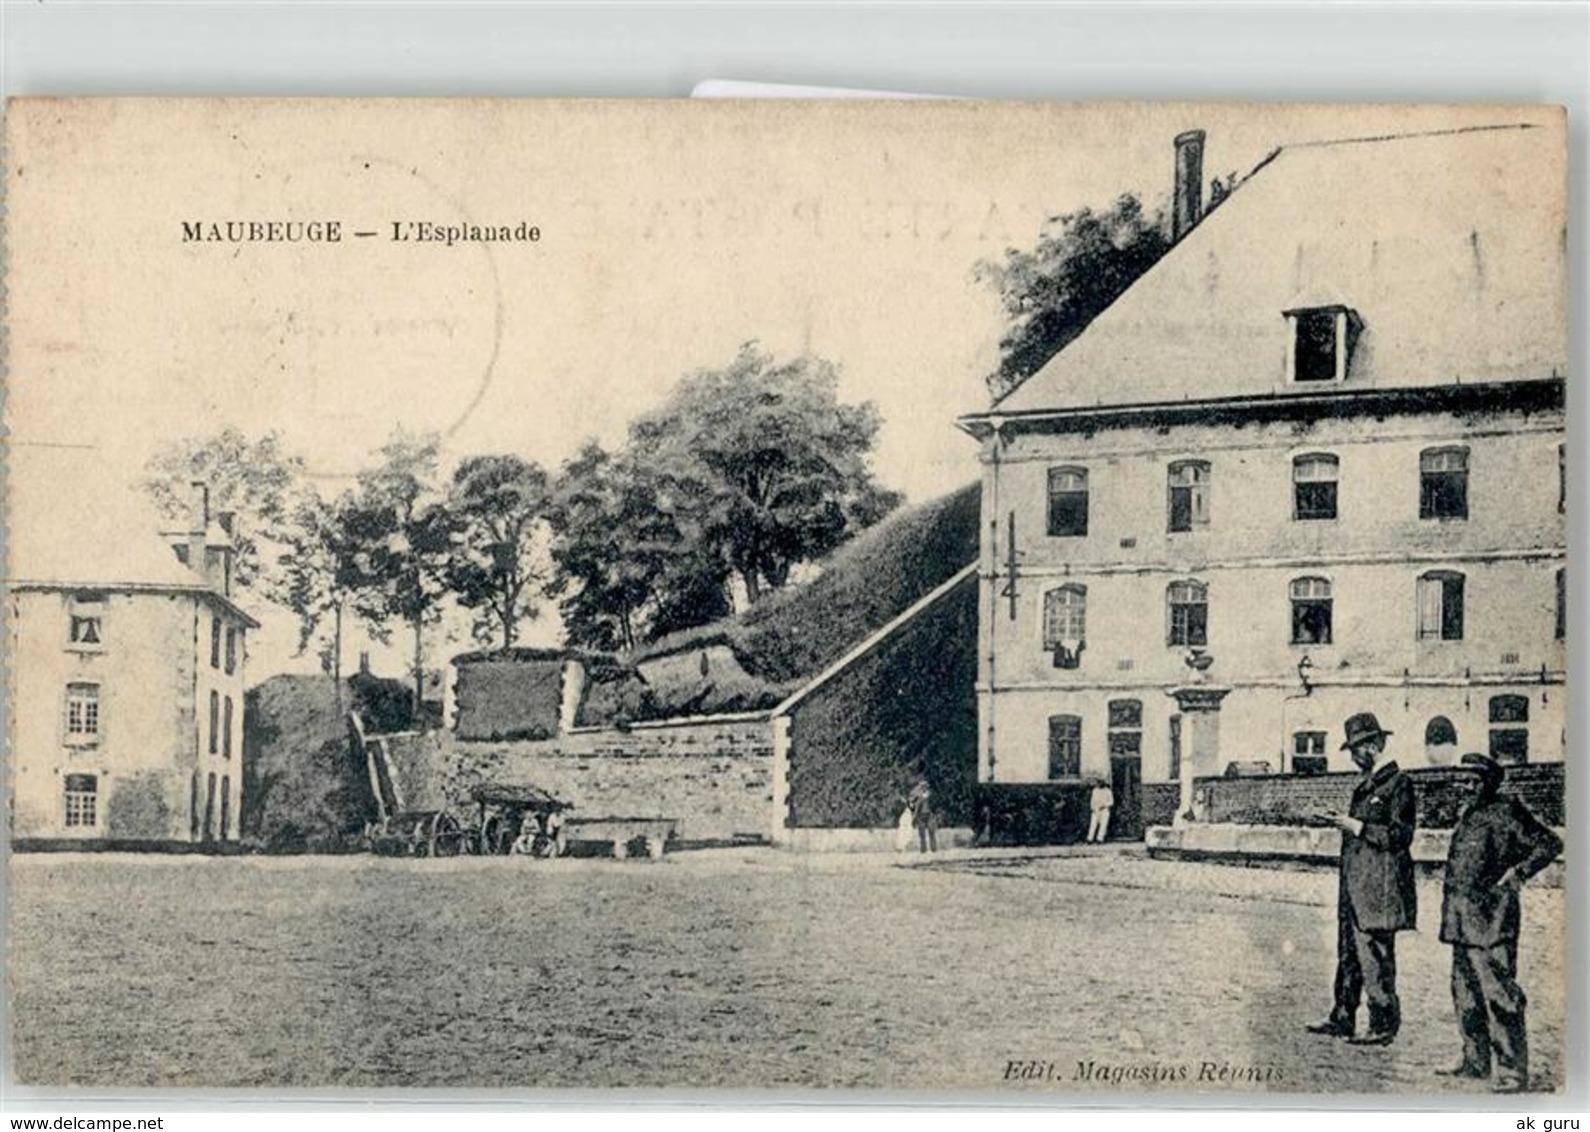 52510379 - Maubeuge - France